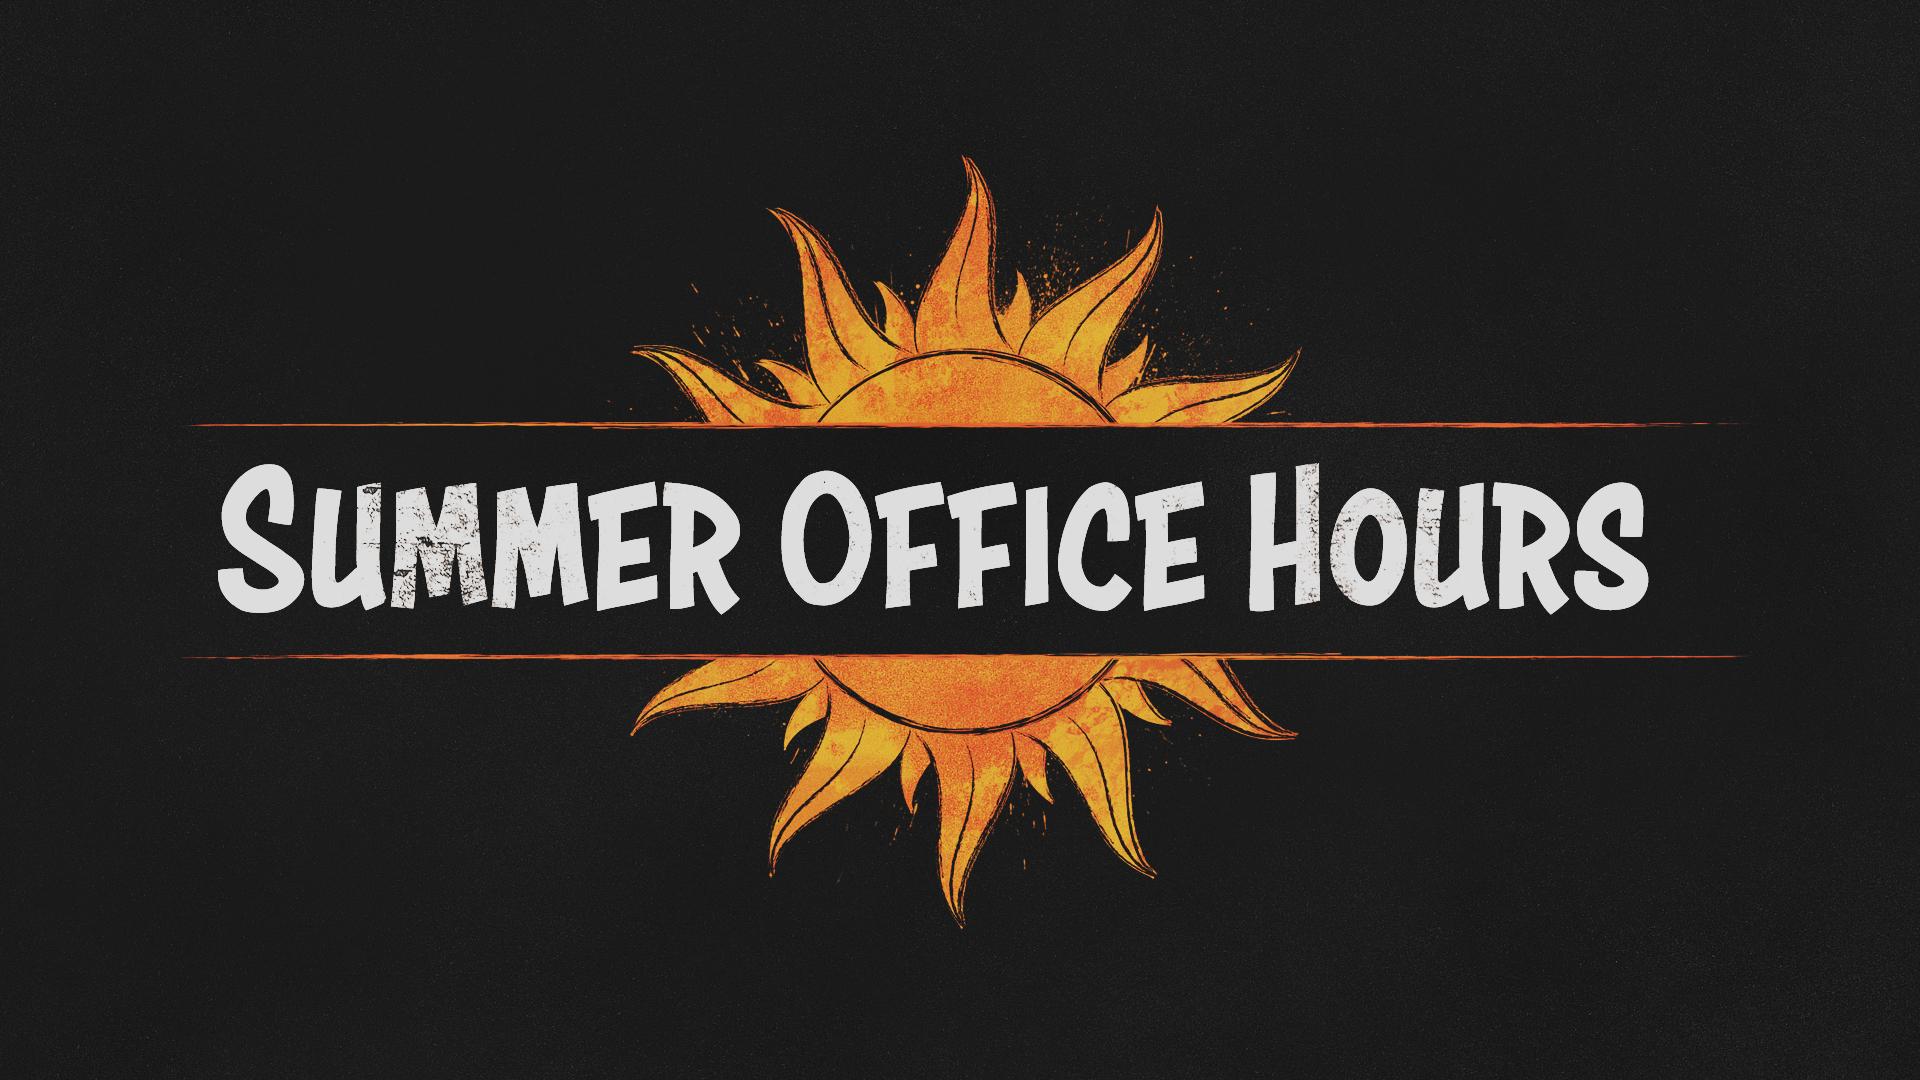 SummerOfficeHoursWIDE.jpg